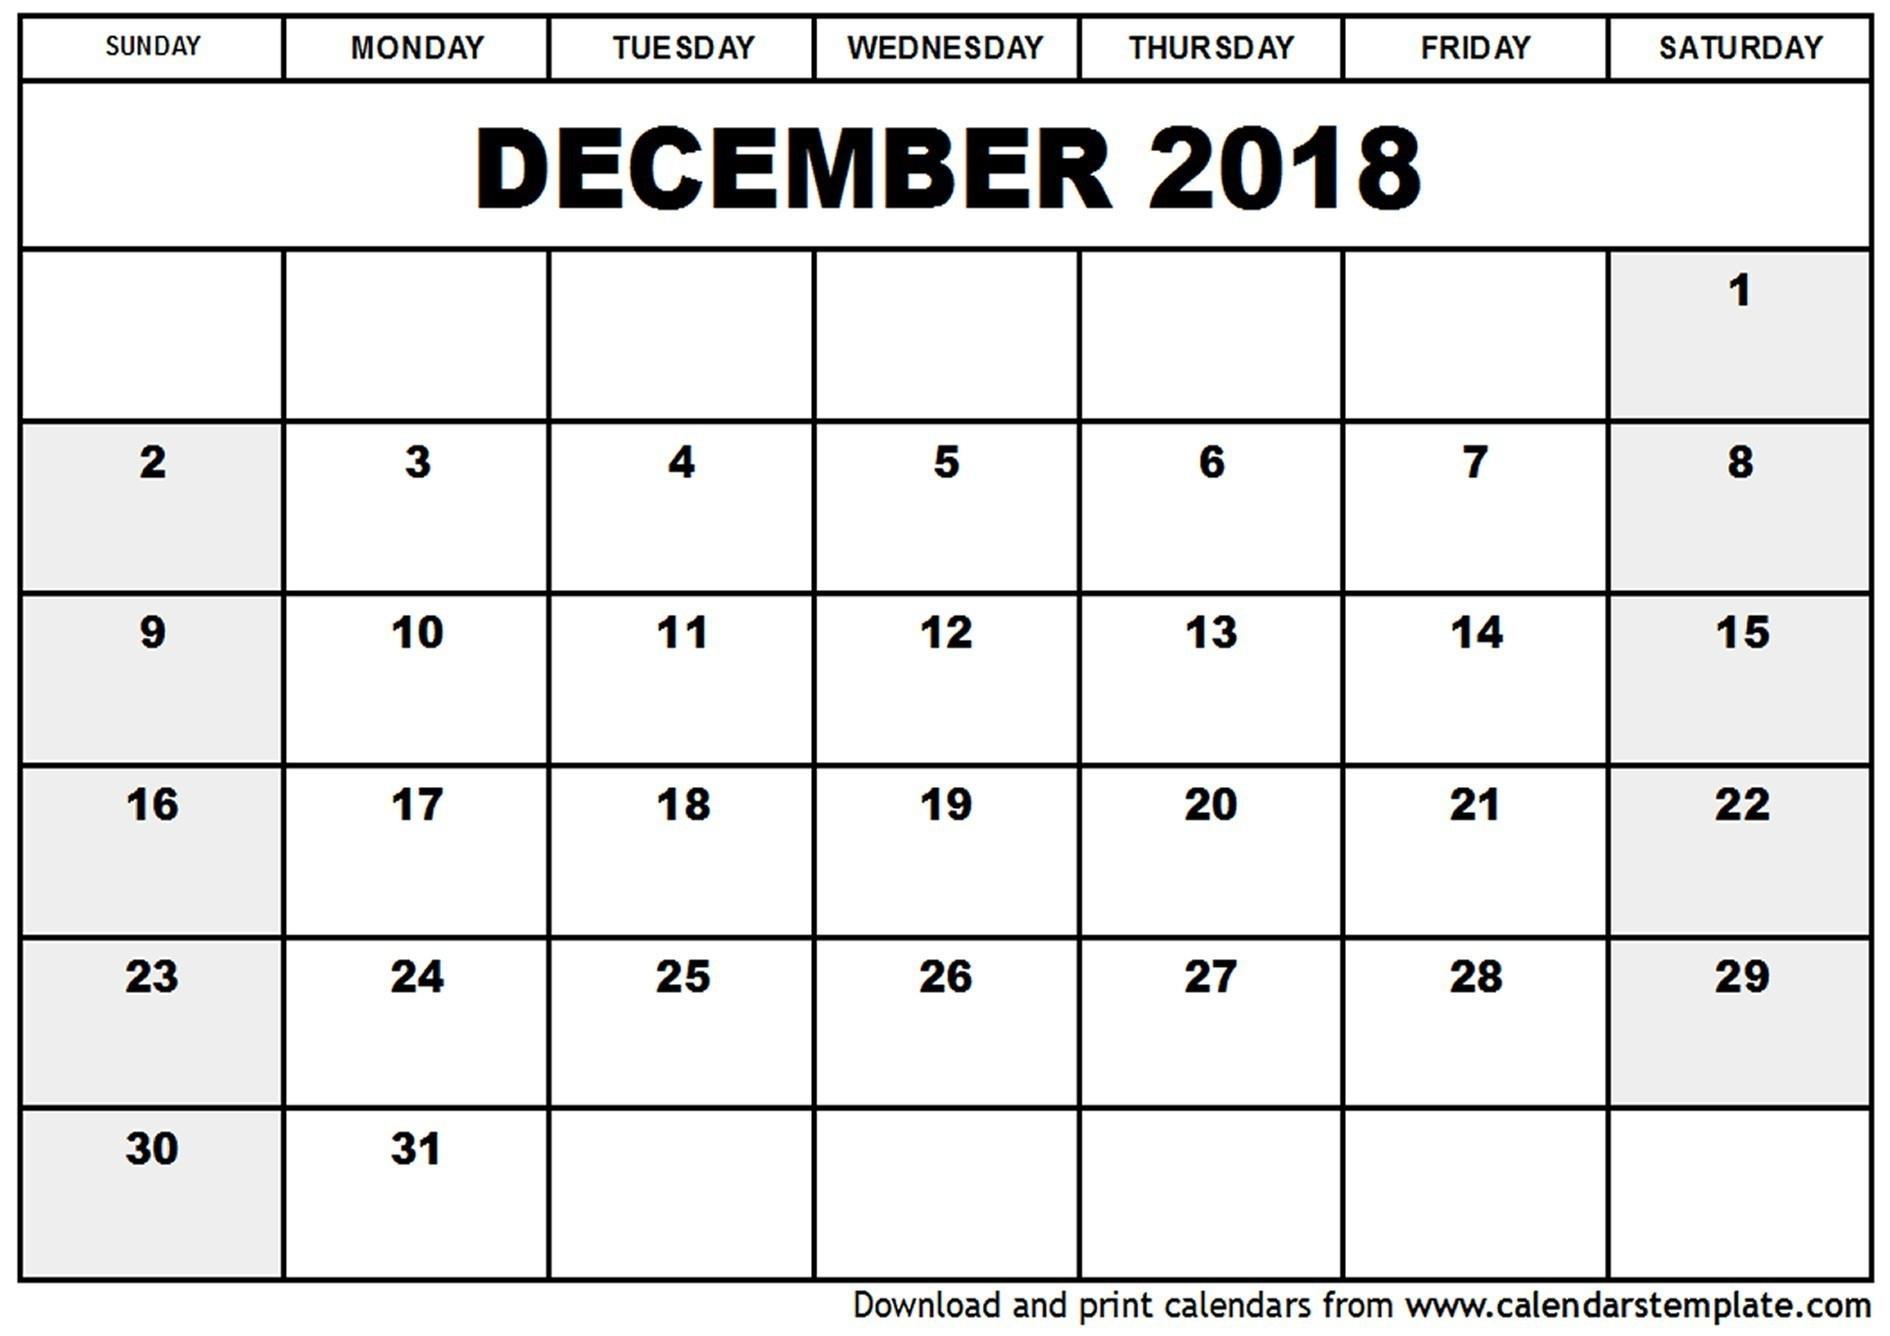 Julian Date Calendar For Year 2018 2019 Julian Date Calendar with regard to Julian Calendar Non Leap Year